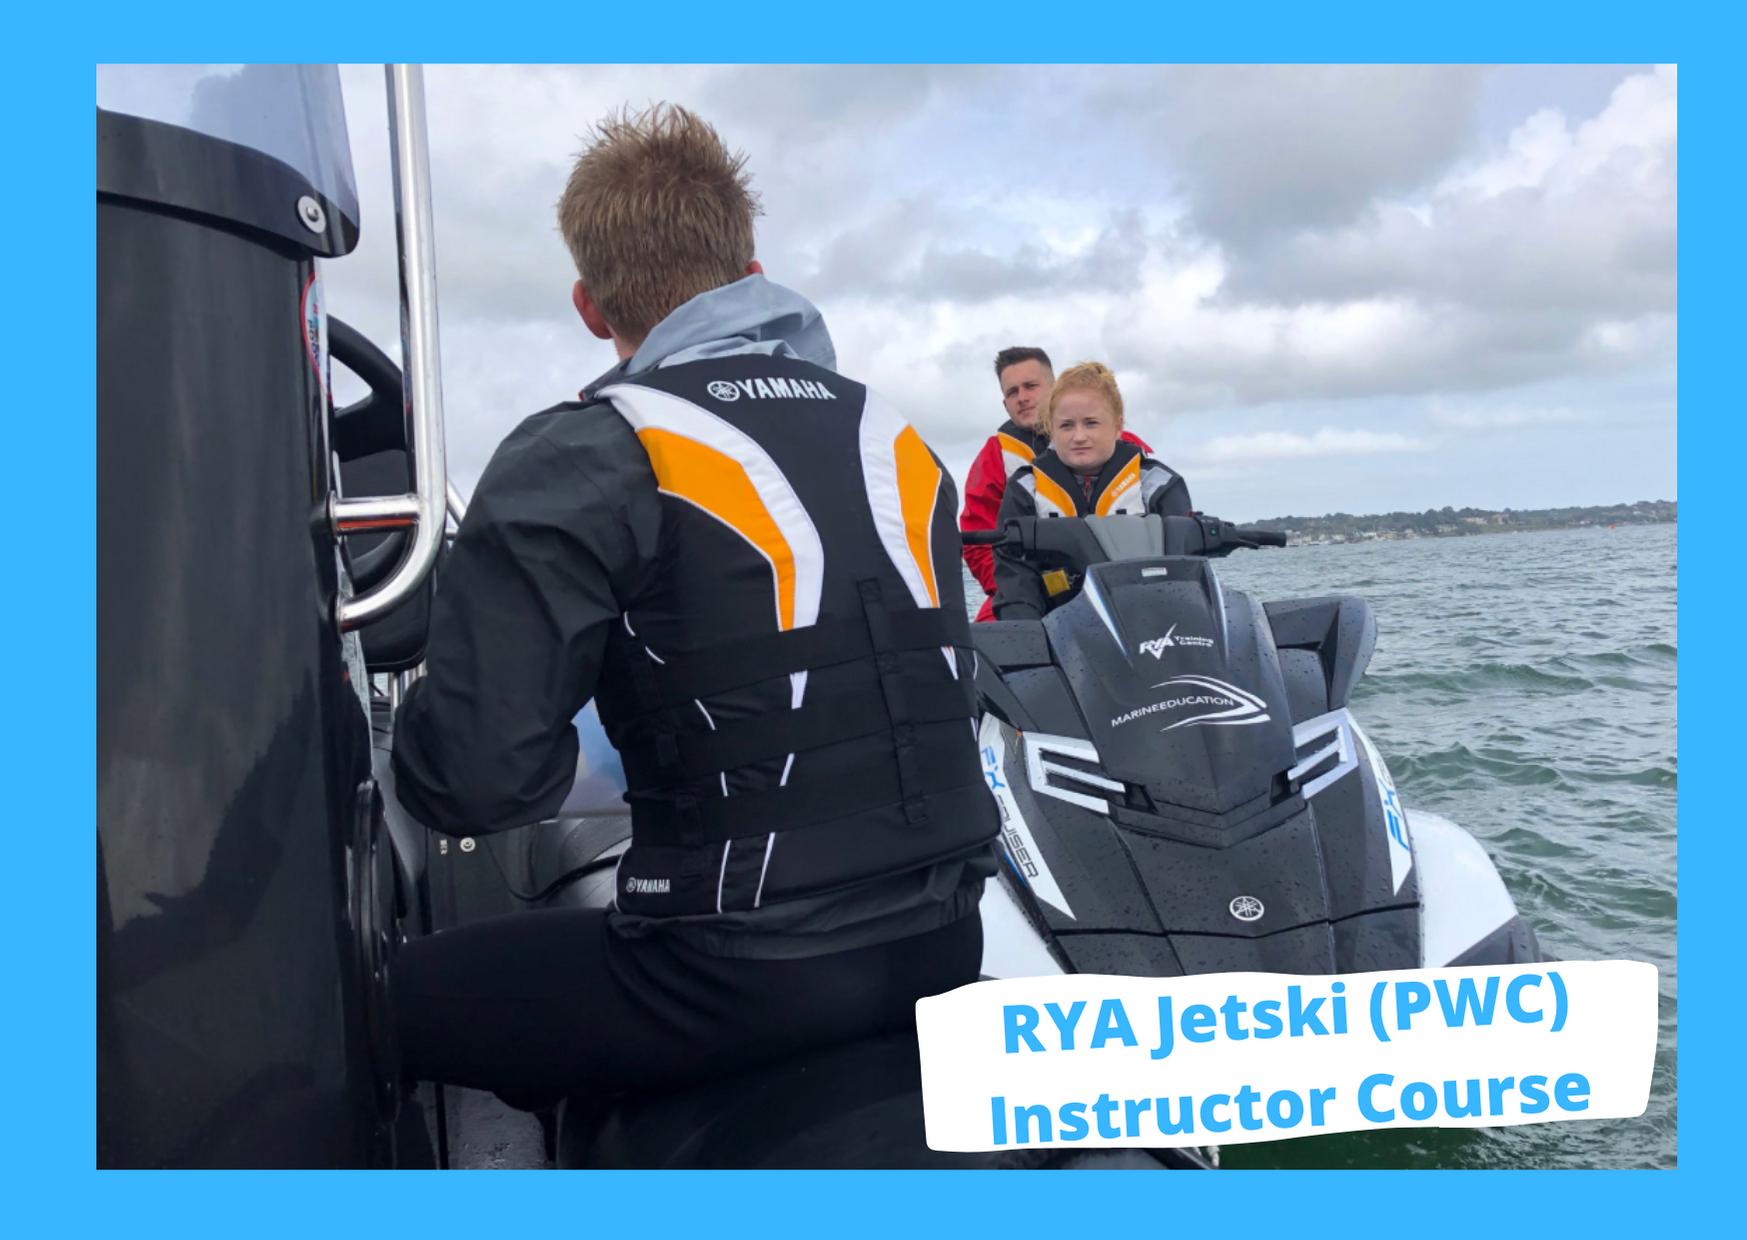 rya jetski pwc instructor course